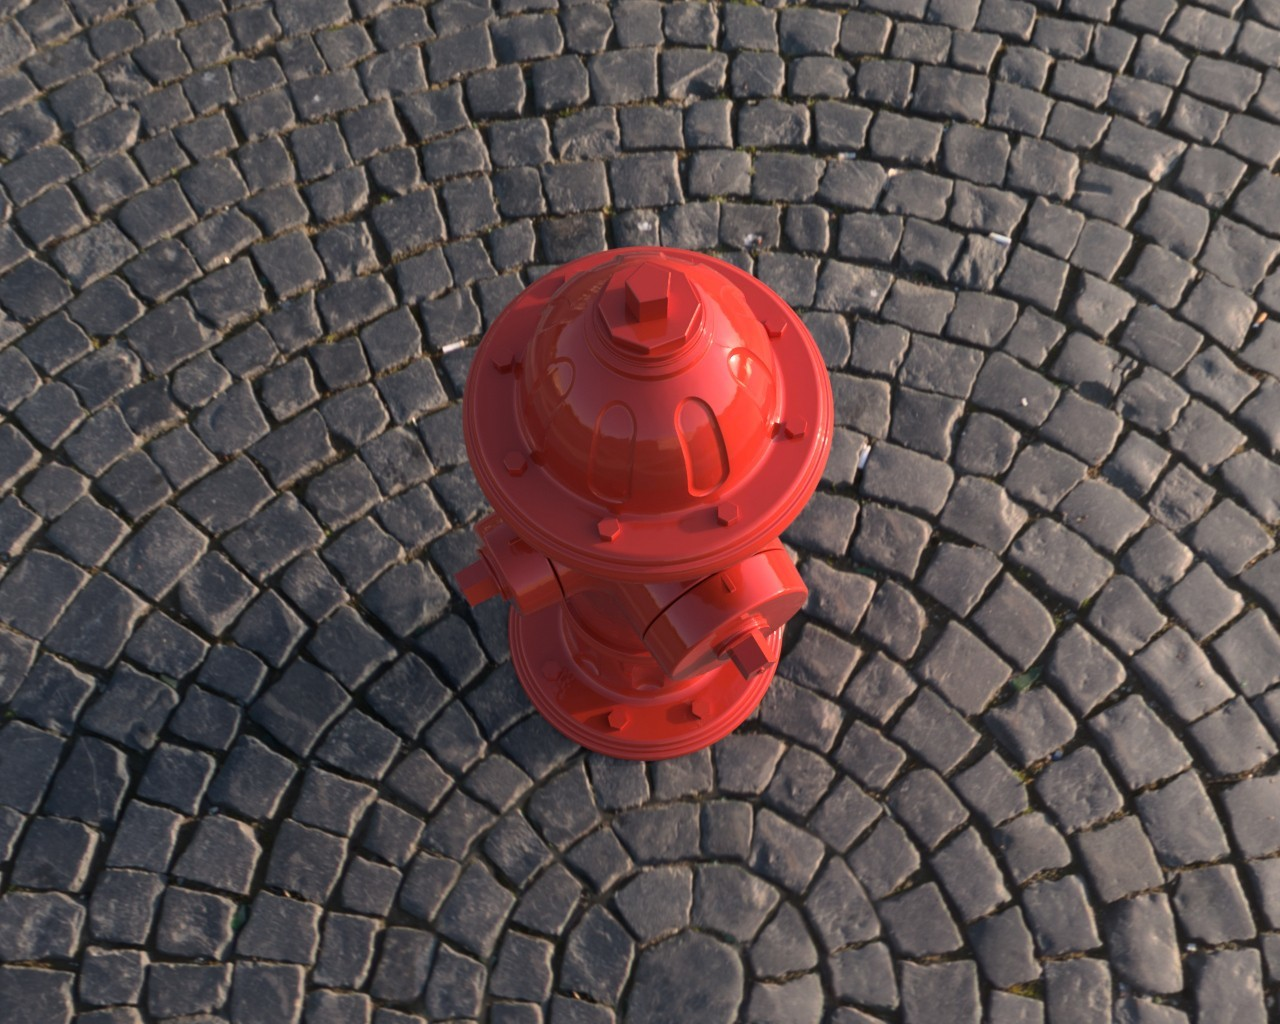 Fire_hydrant_2017-Nov-09_01-49-55PM-000_CustomizedView7192565730_jpg.jpg Download STL file Fire hydrant • Model to 3D print, AntonShtern